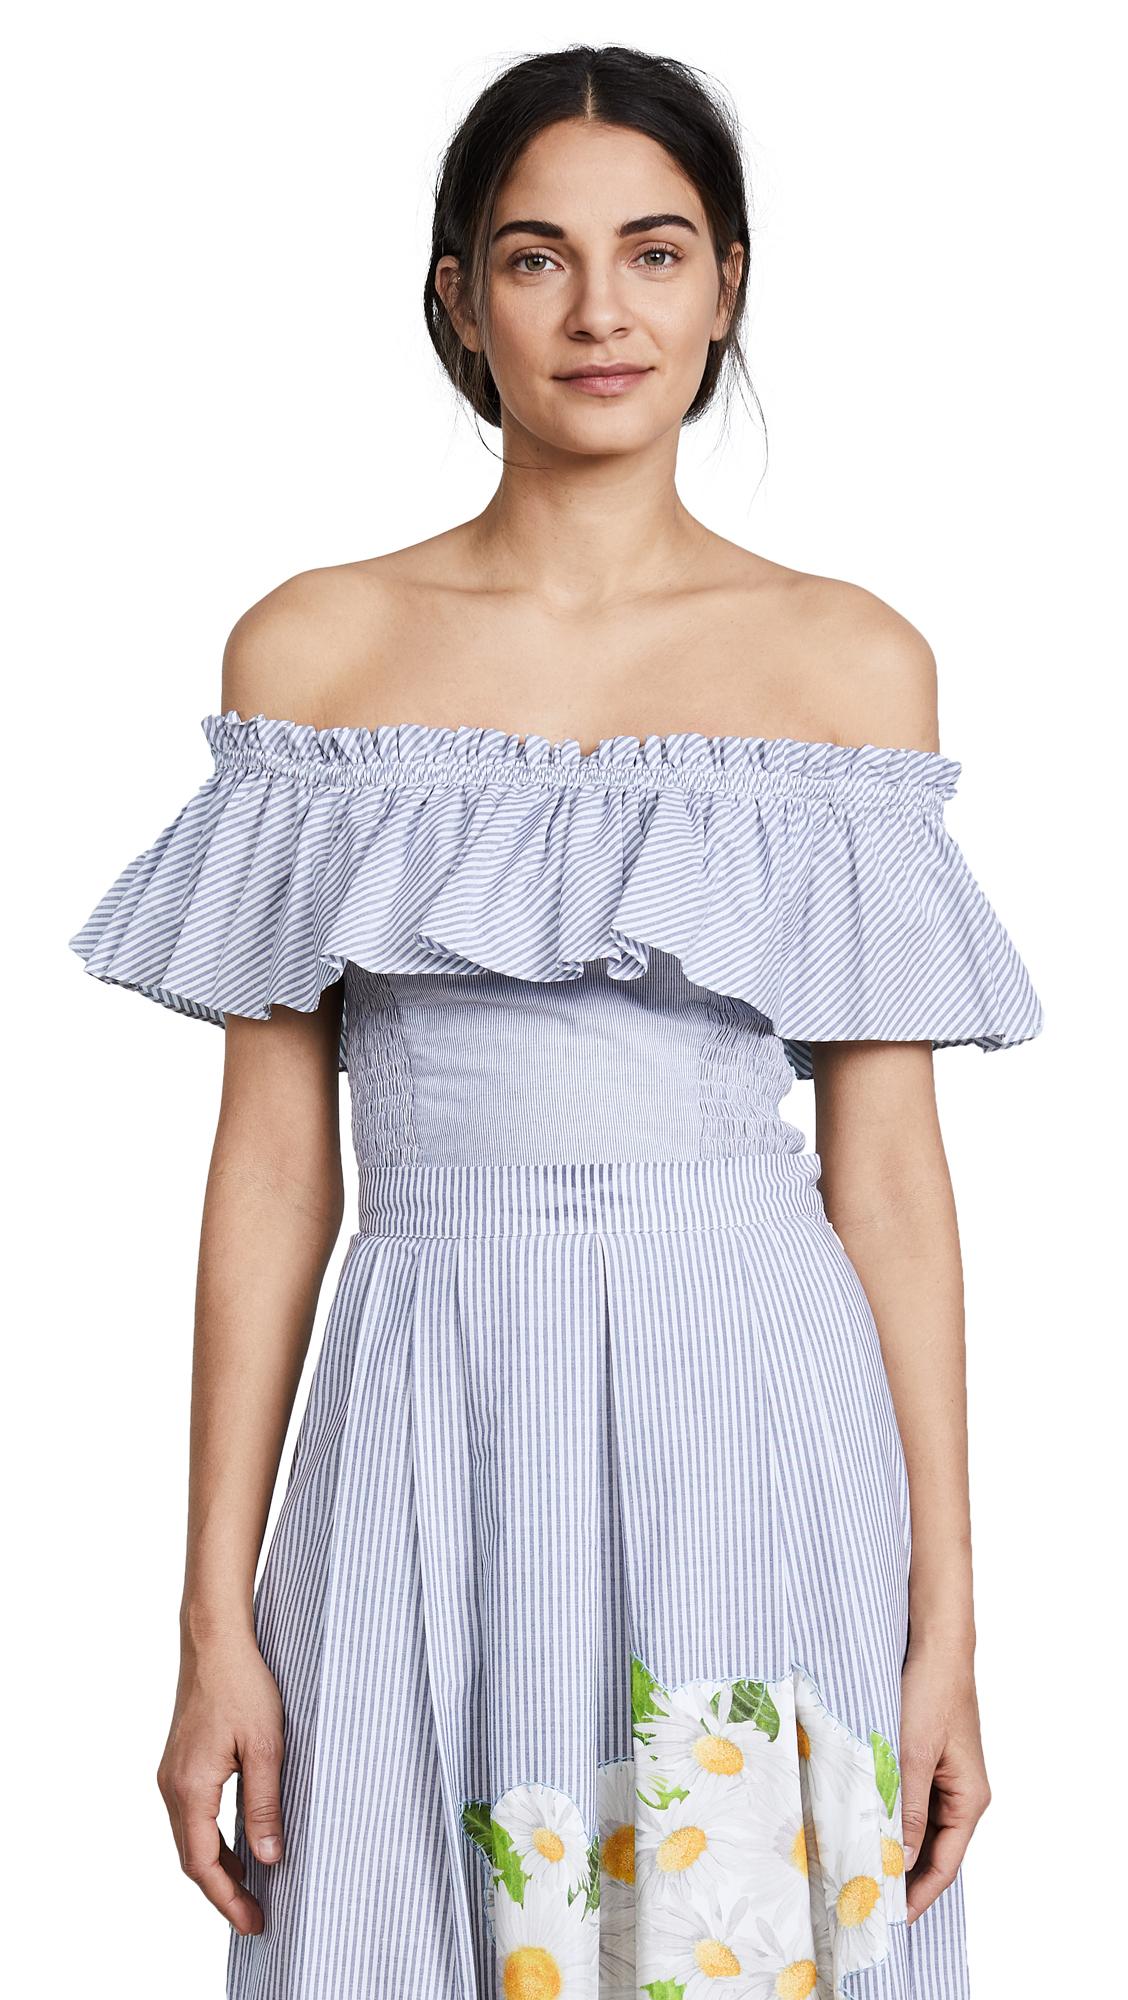 Isolda Amanda Striped Crop Top - Blue/White